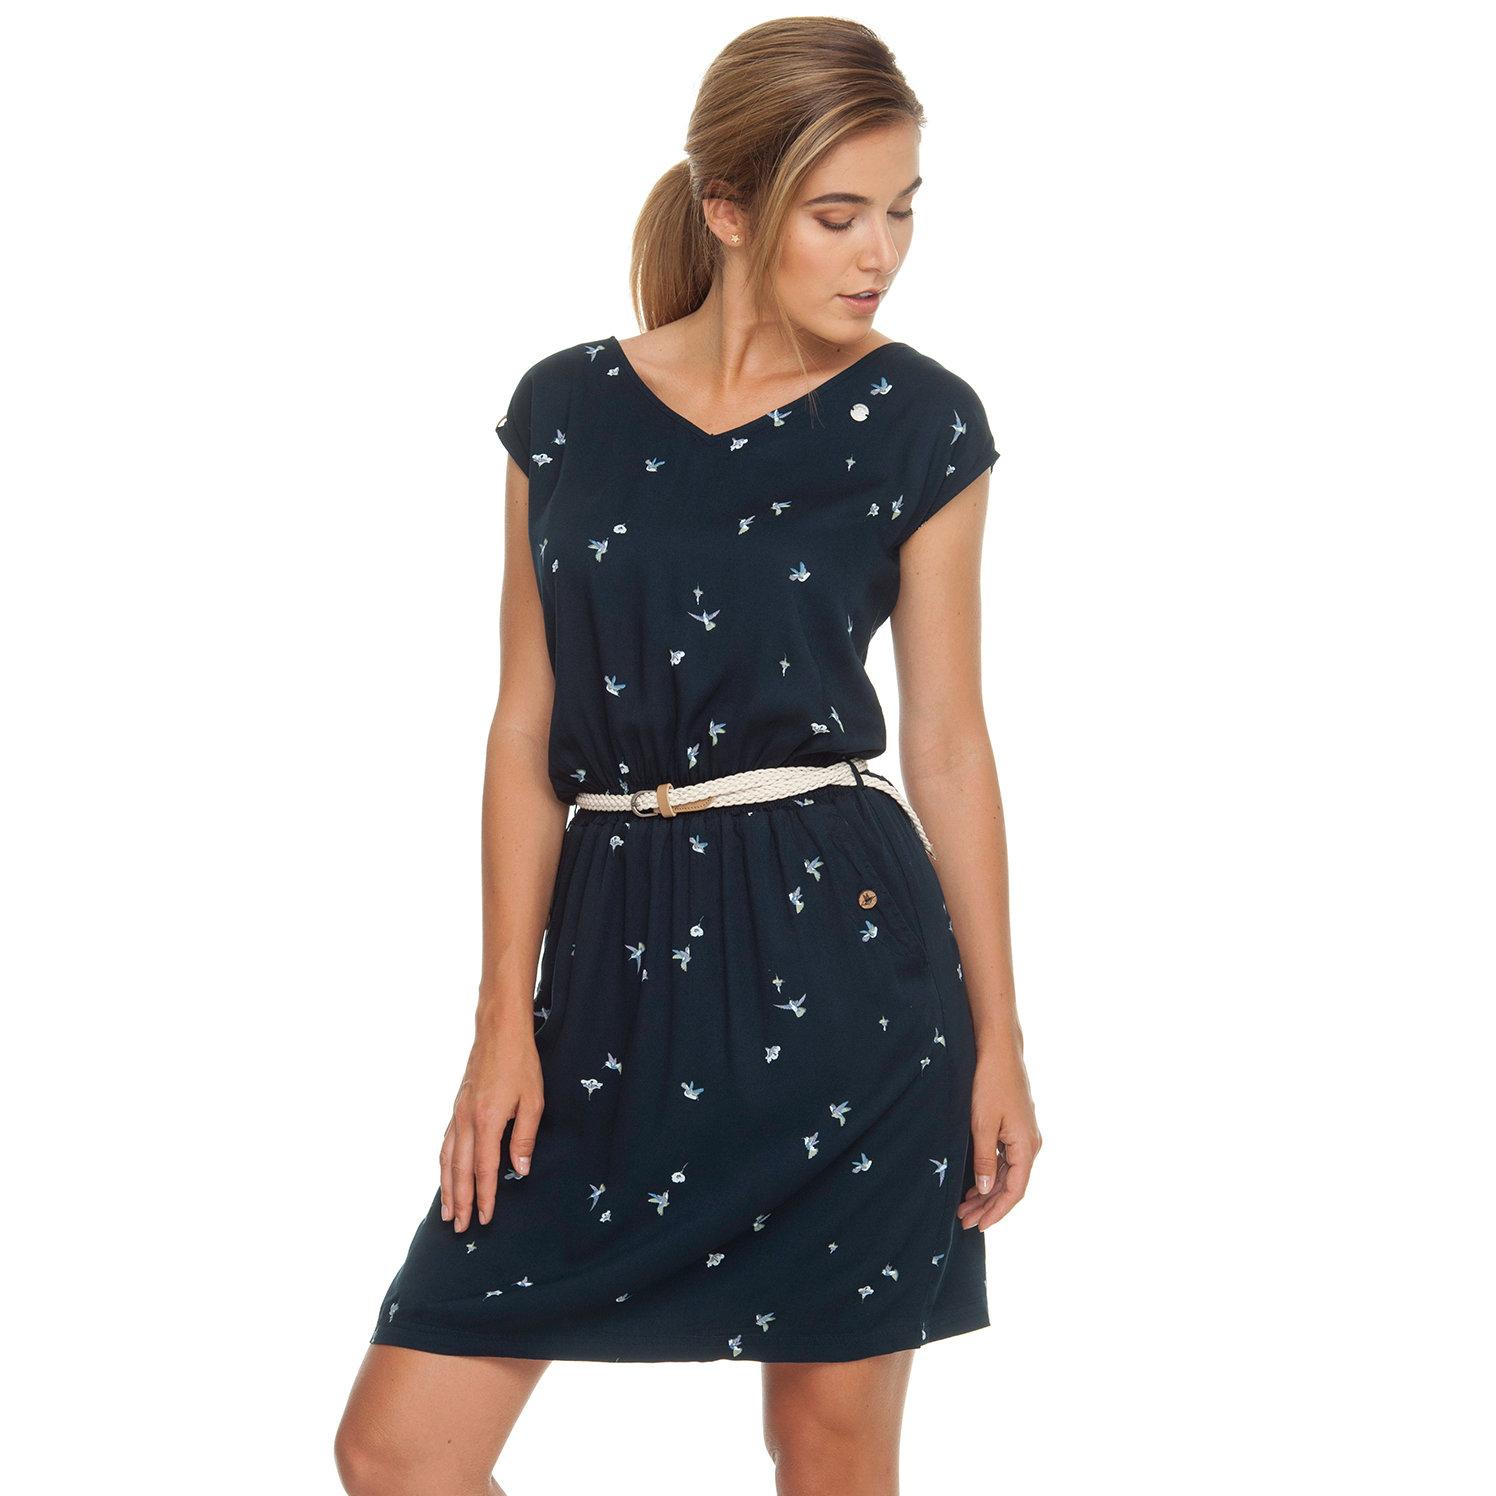 Ragwear Damen Kleid mit Gürtel V Neck Carolina navy blau